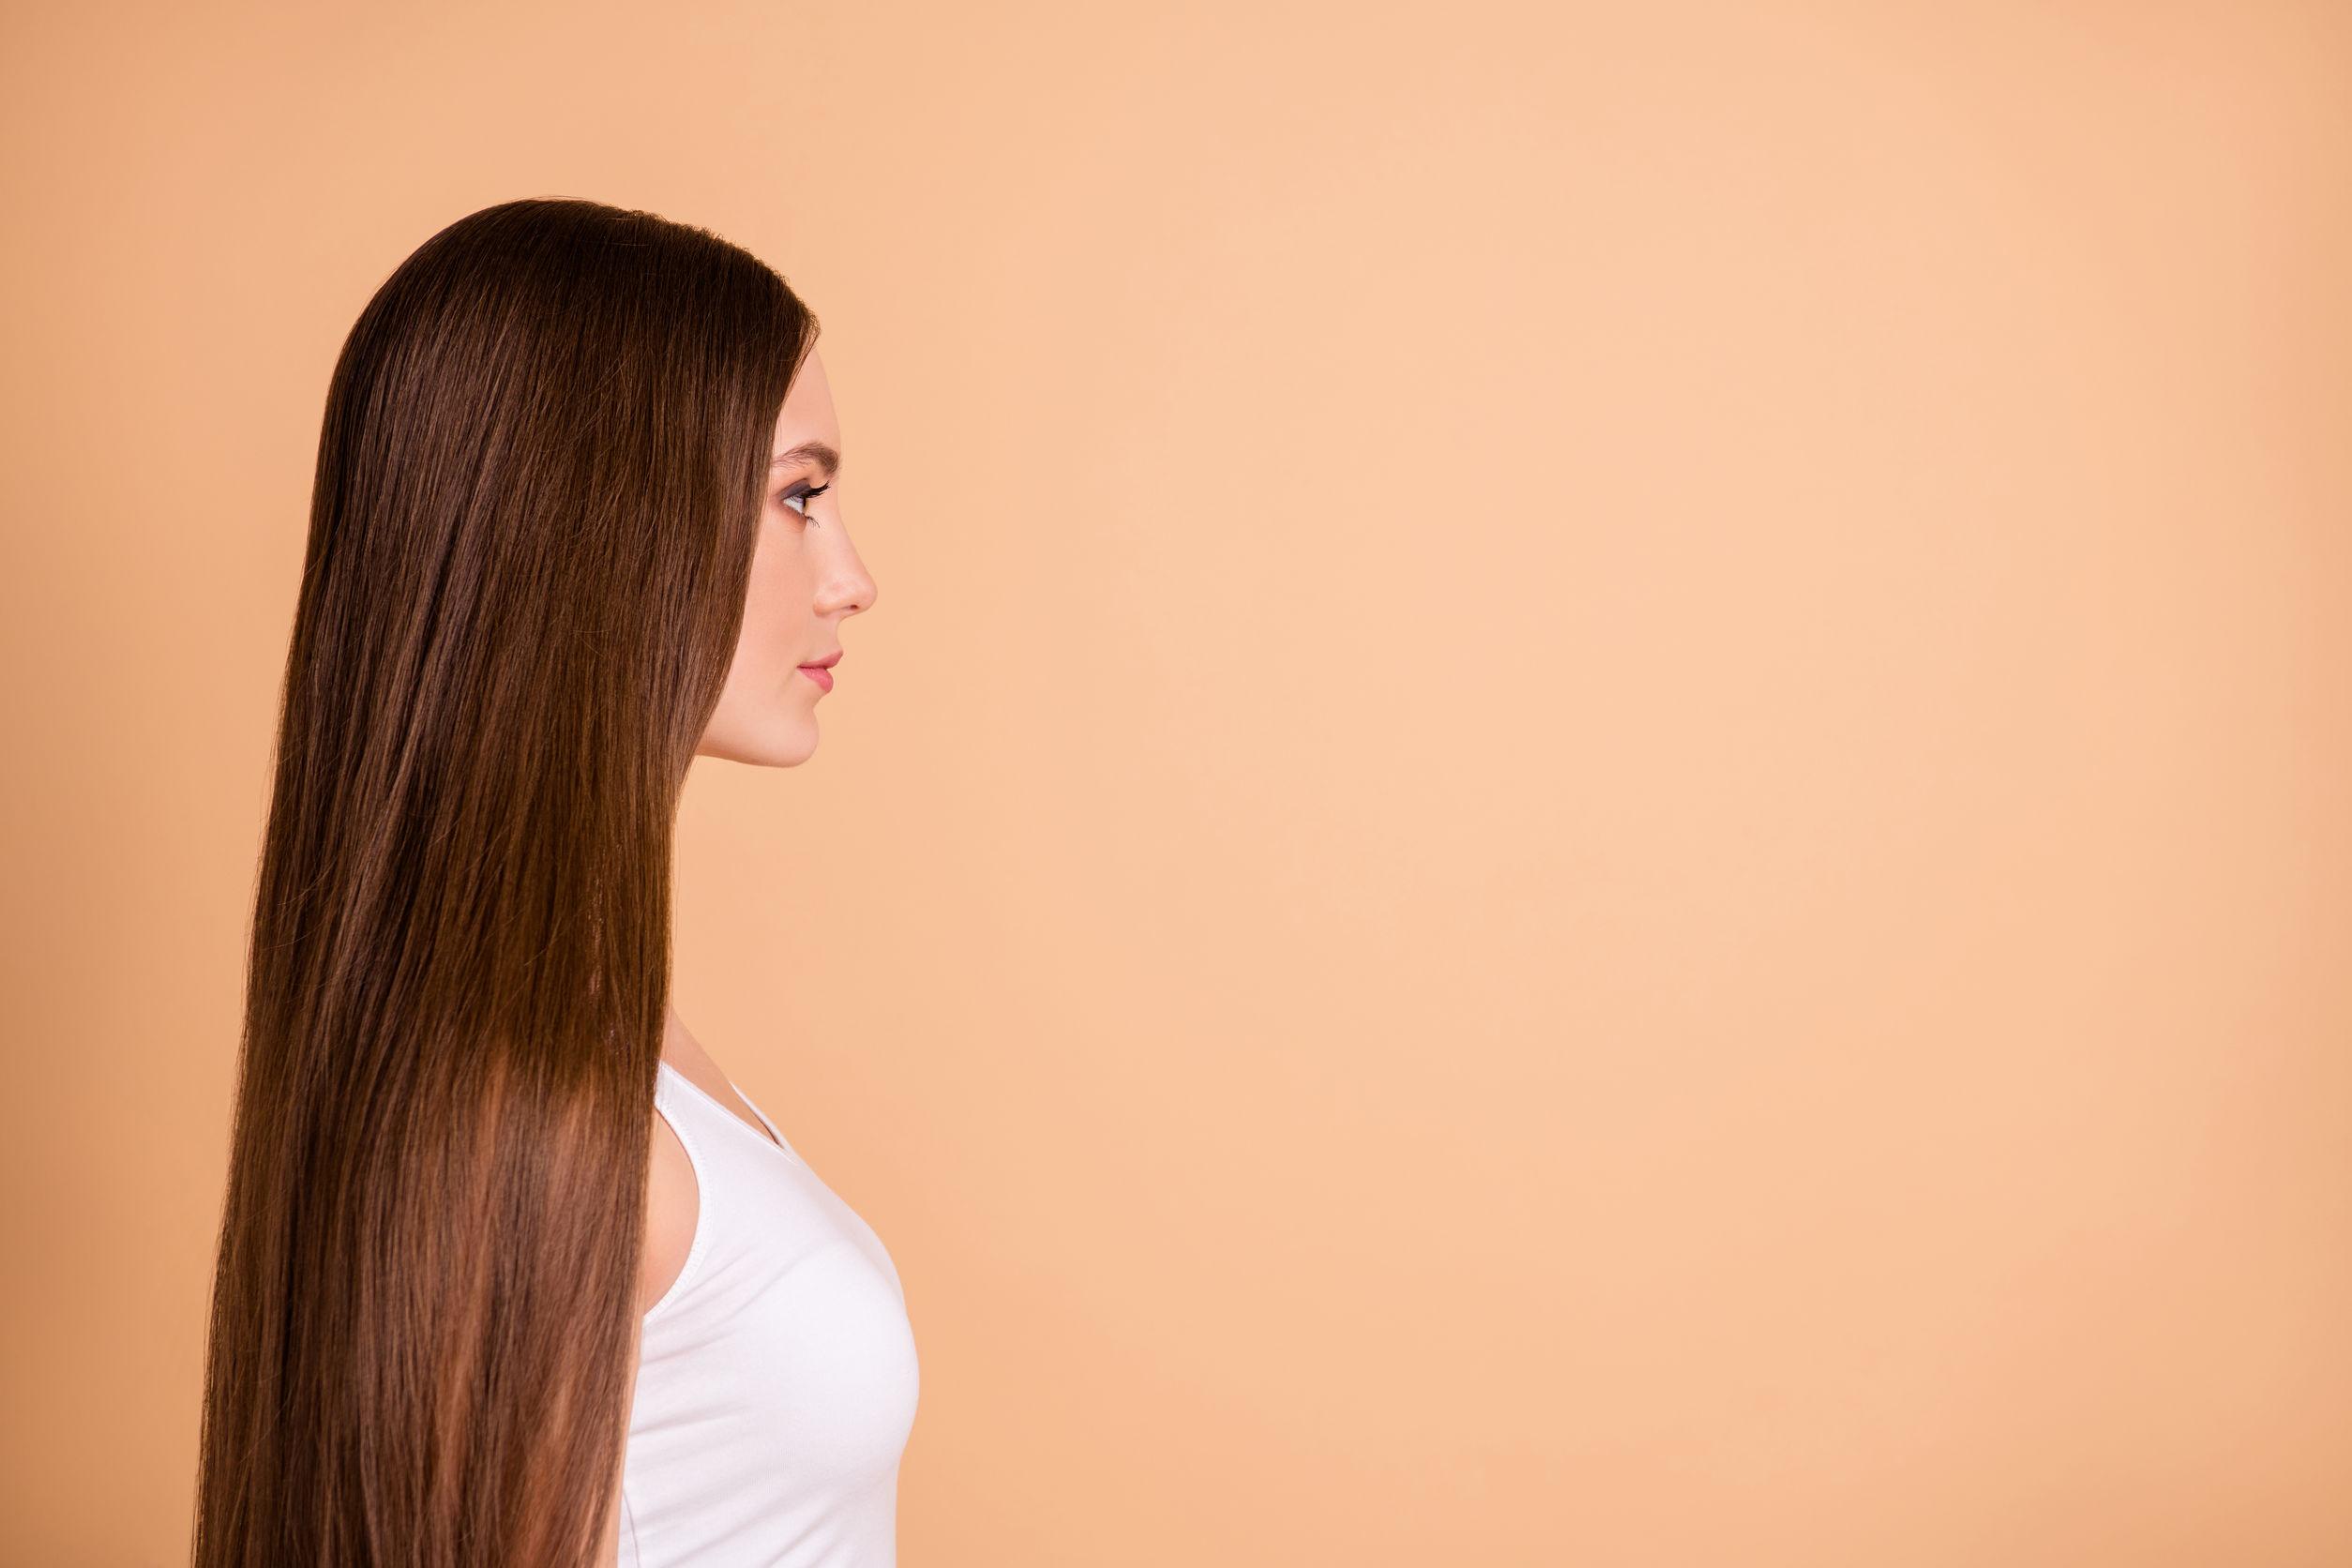 Vista de perfil de mujer de cabello largo castaño